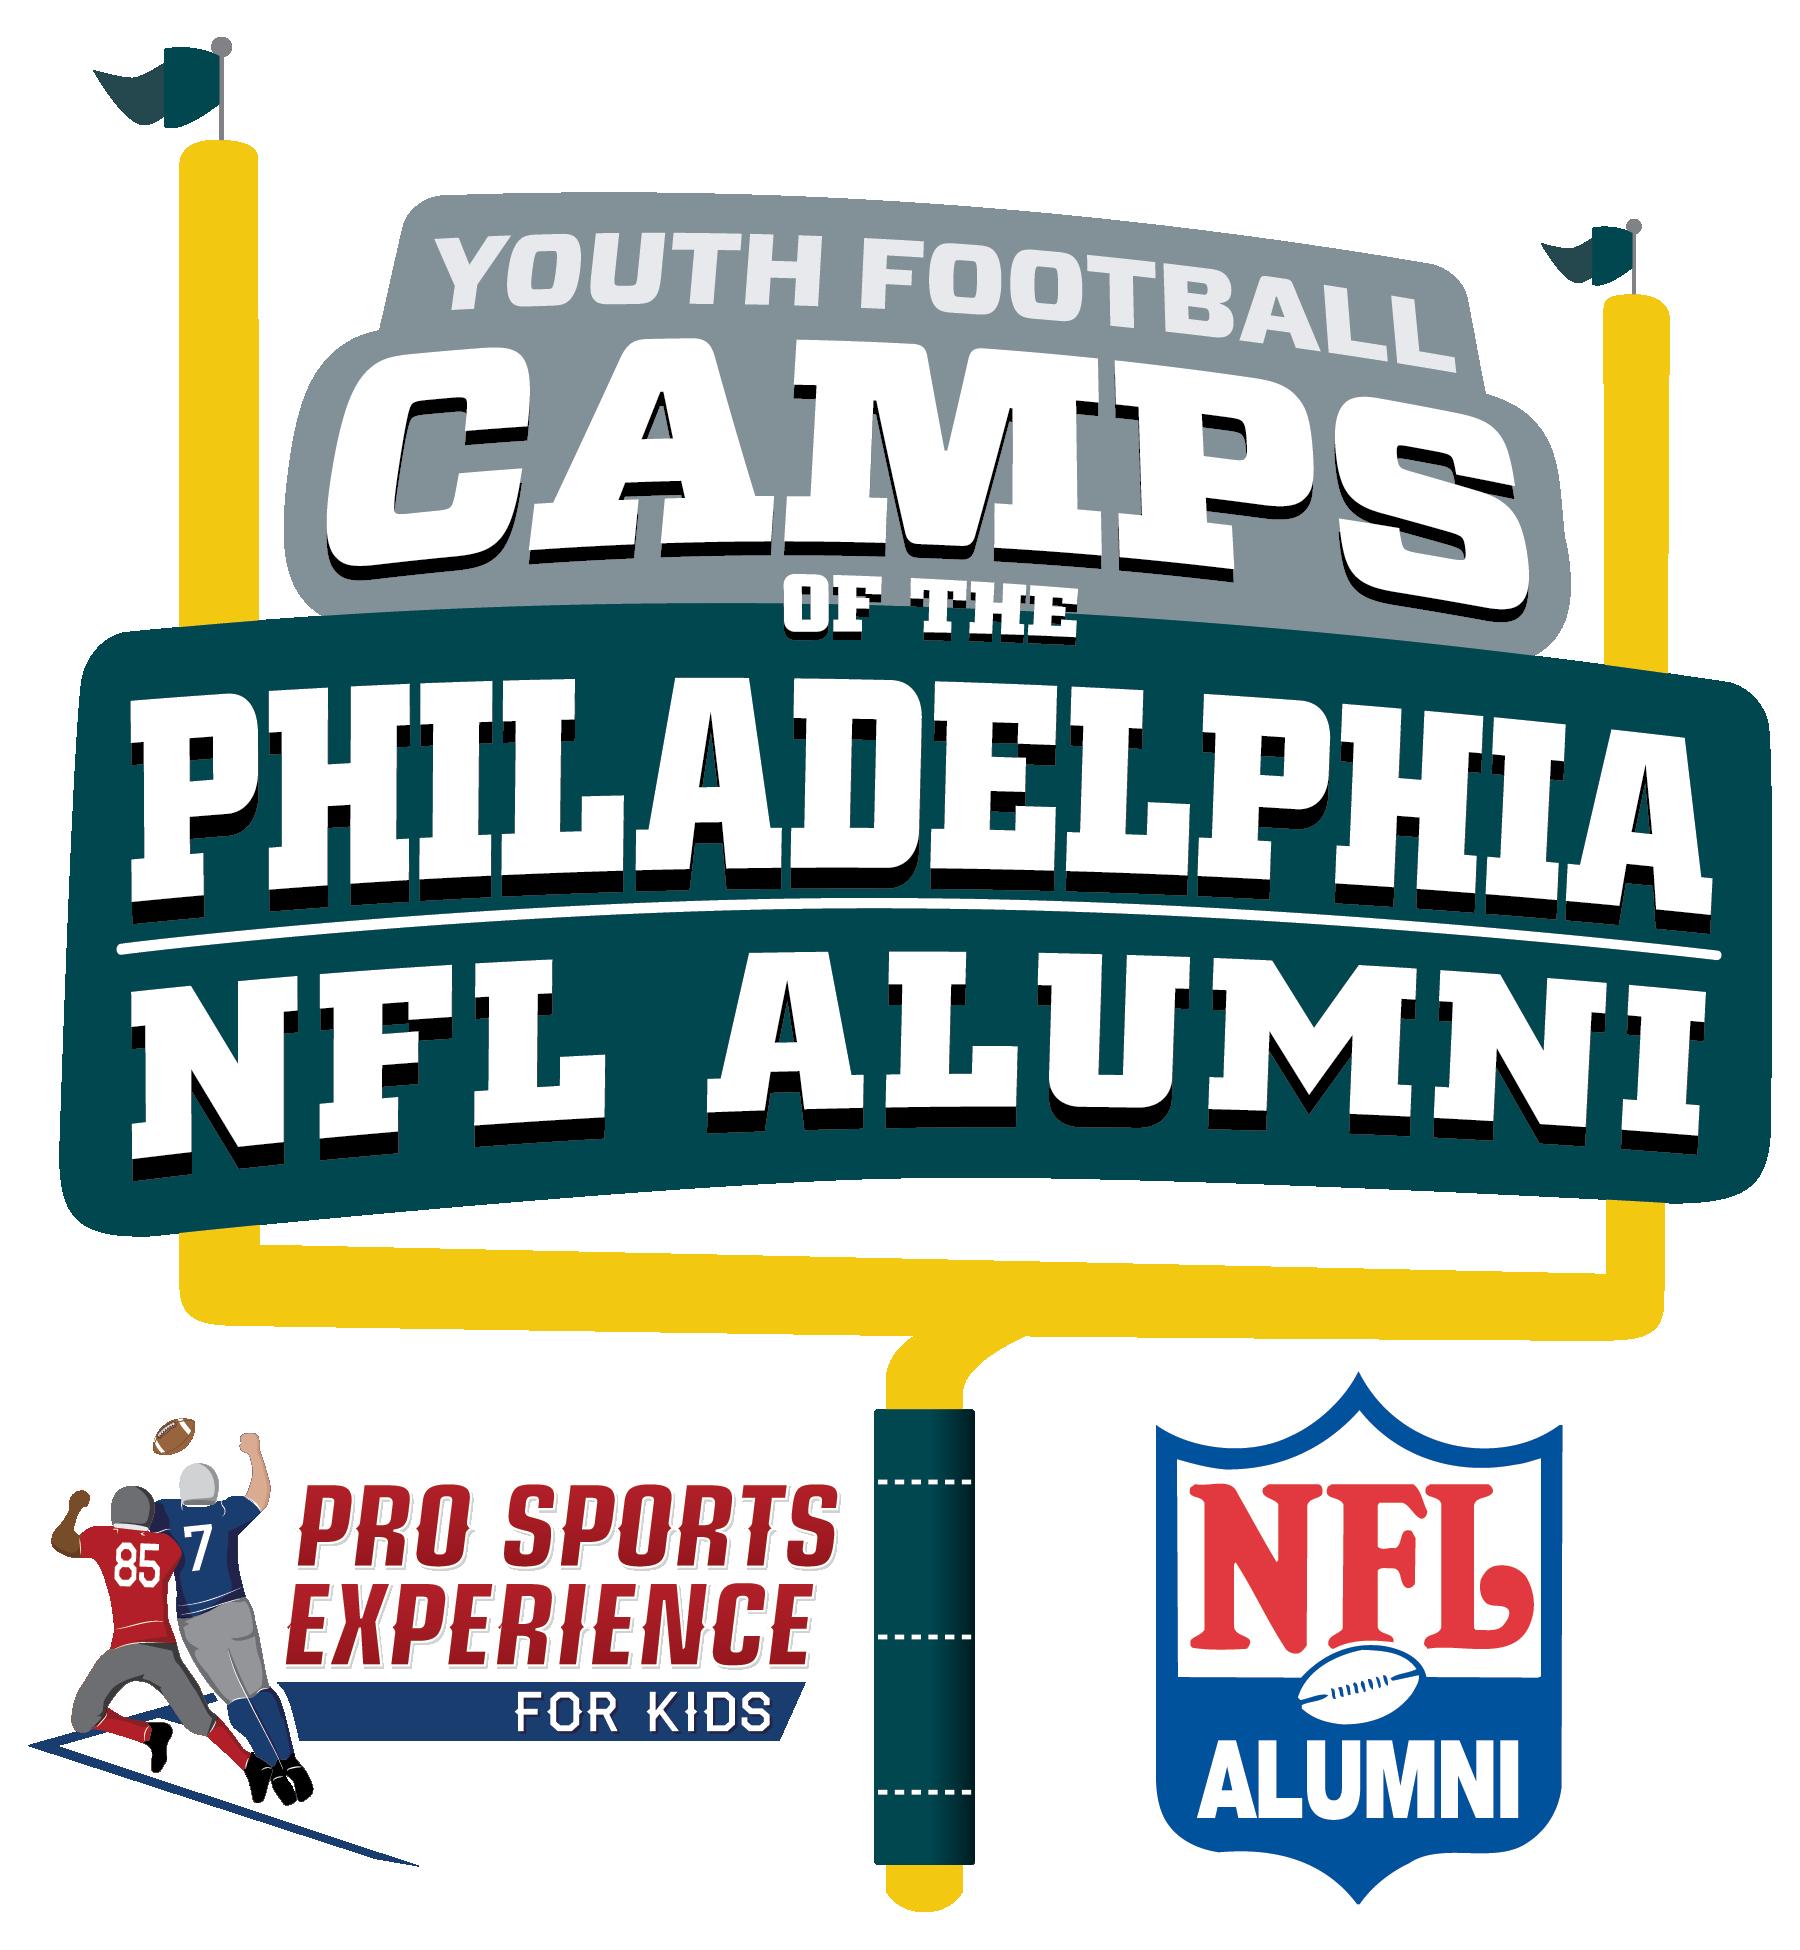 Philadelphia NFL Alumni Hero Youth Football Camps - Philadelphia